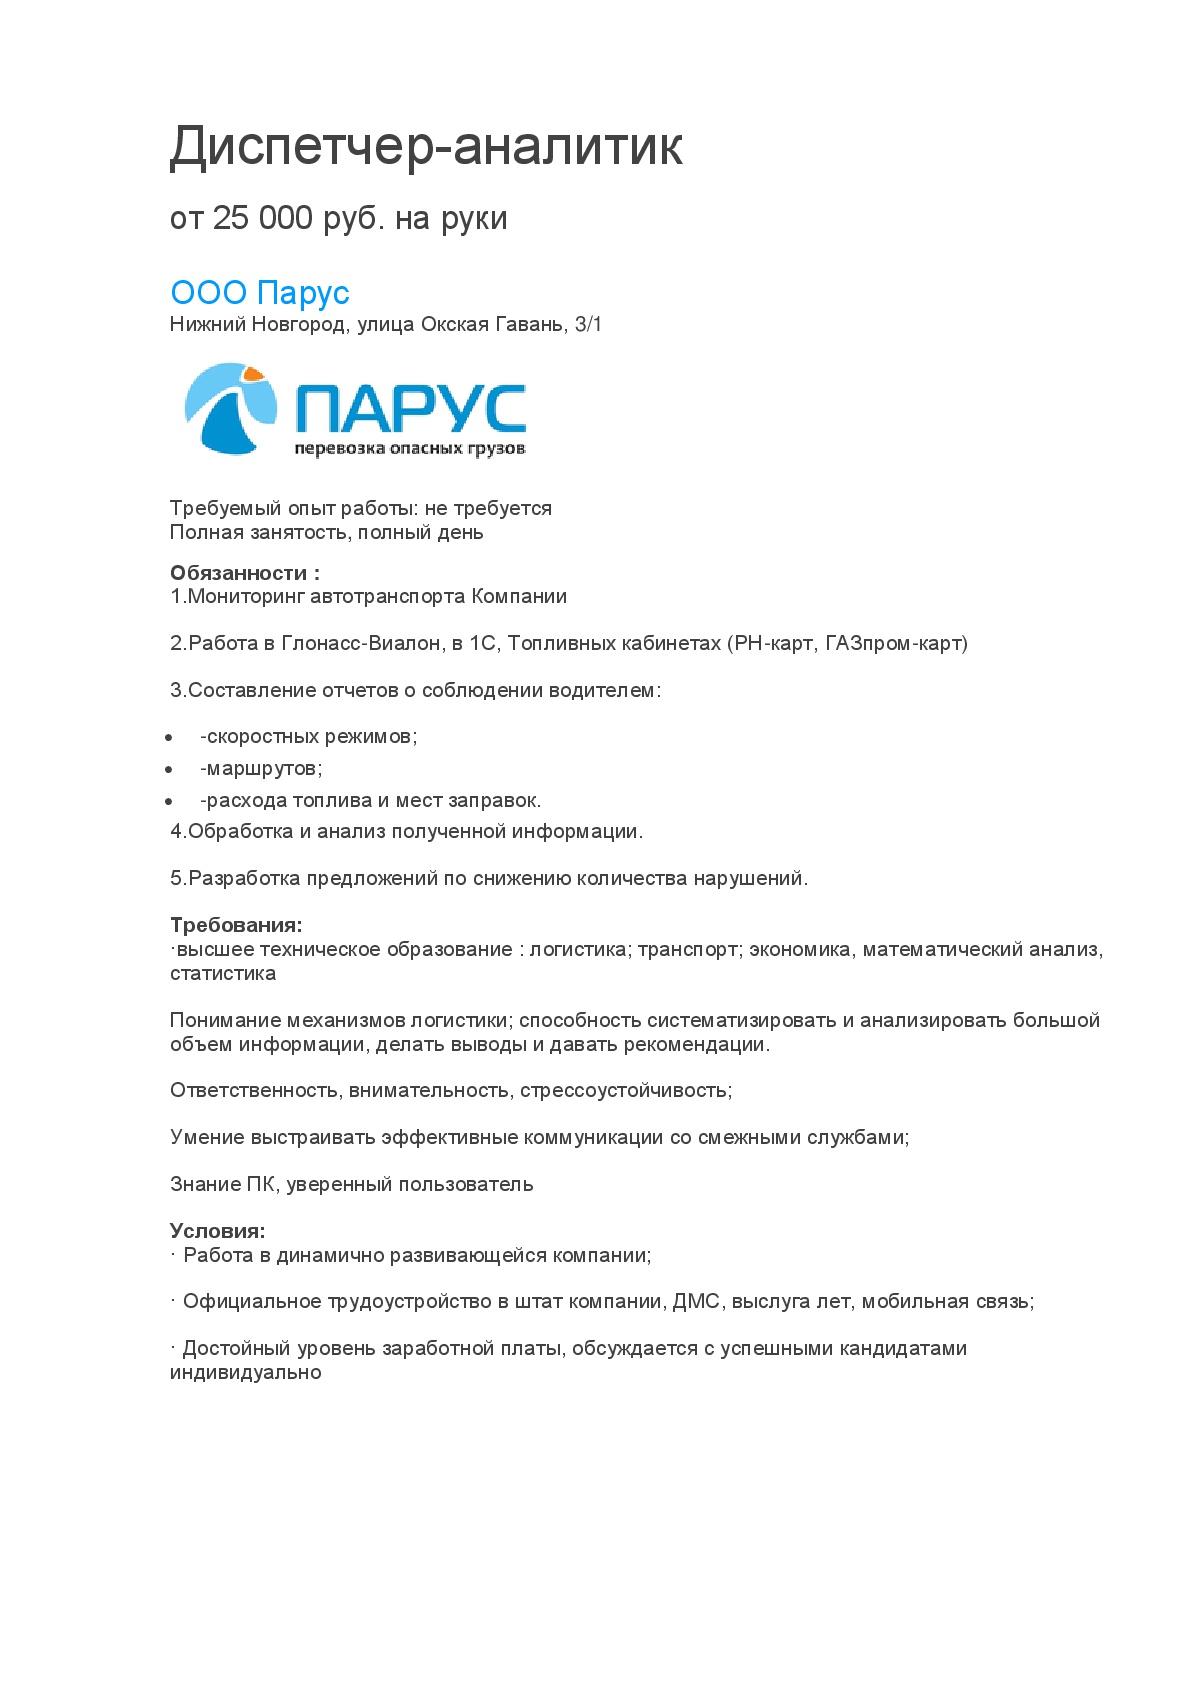 Диспетчер-аналитик-001